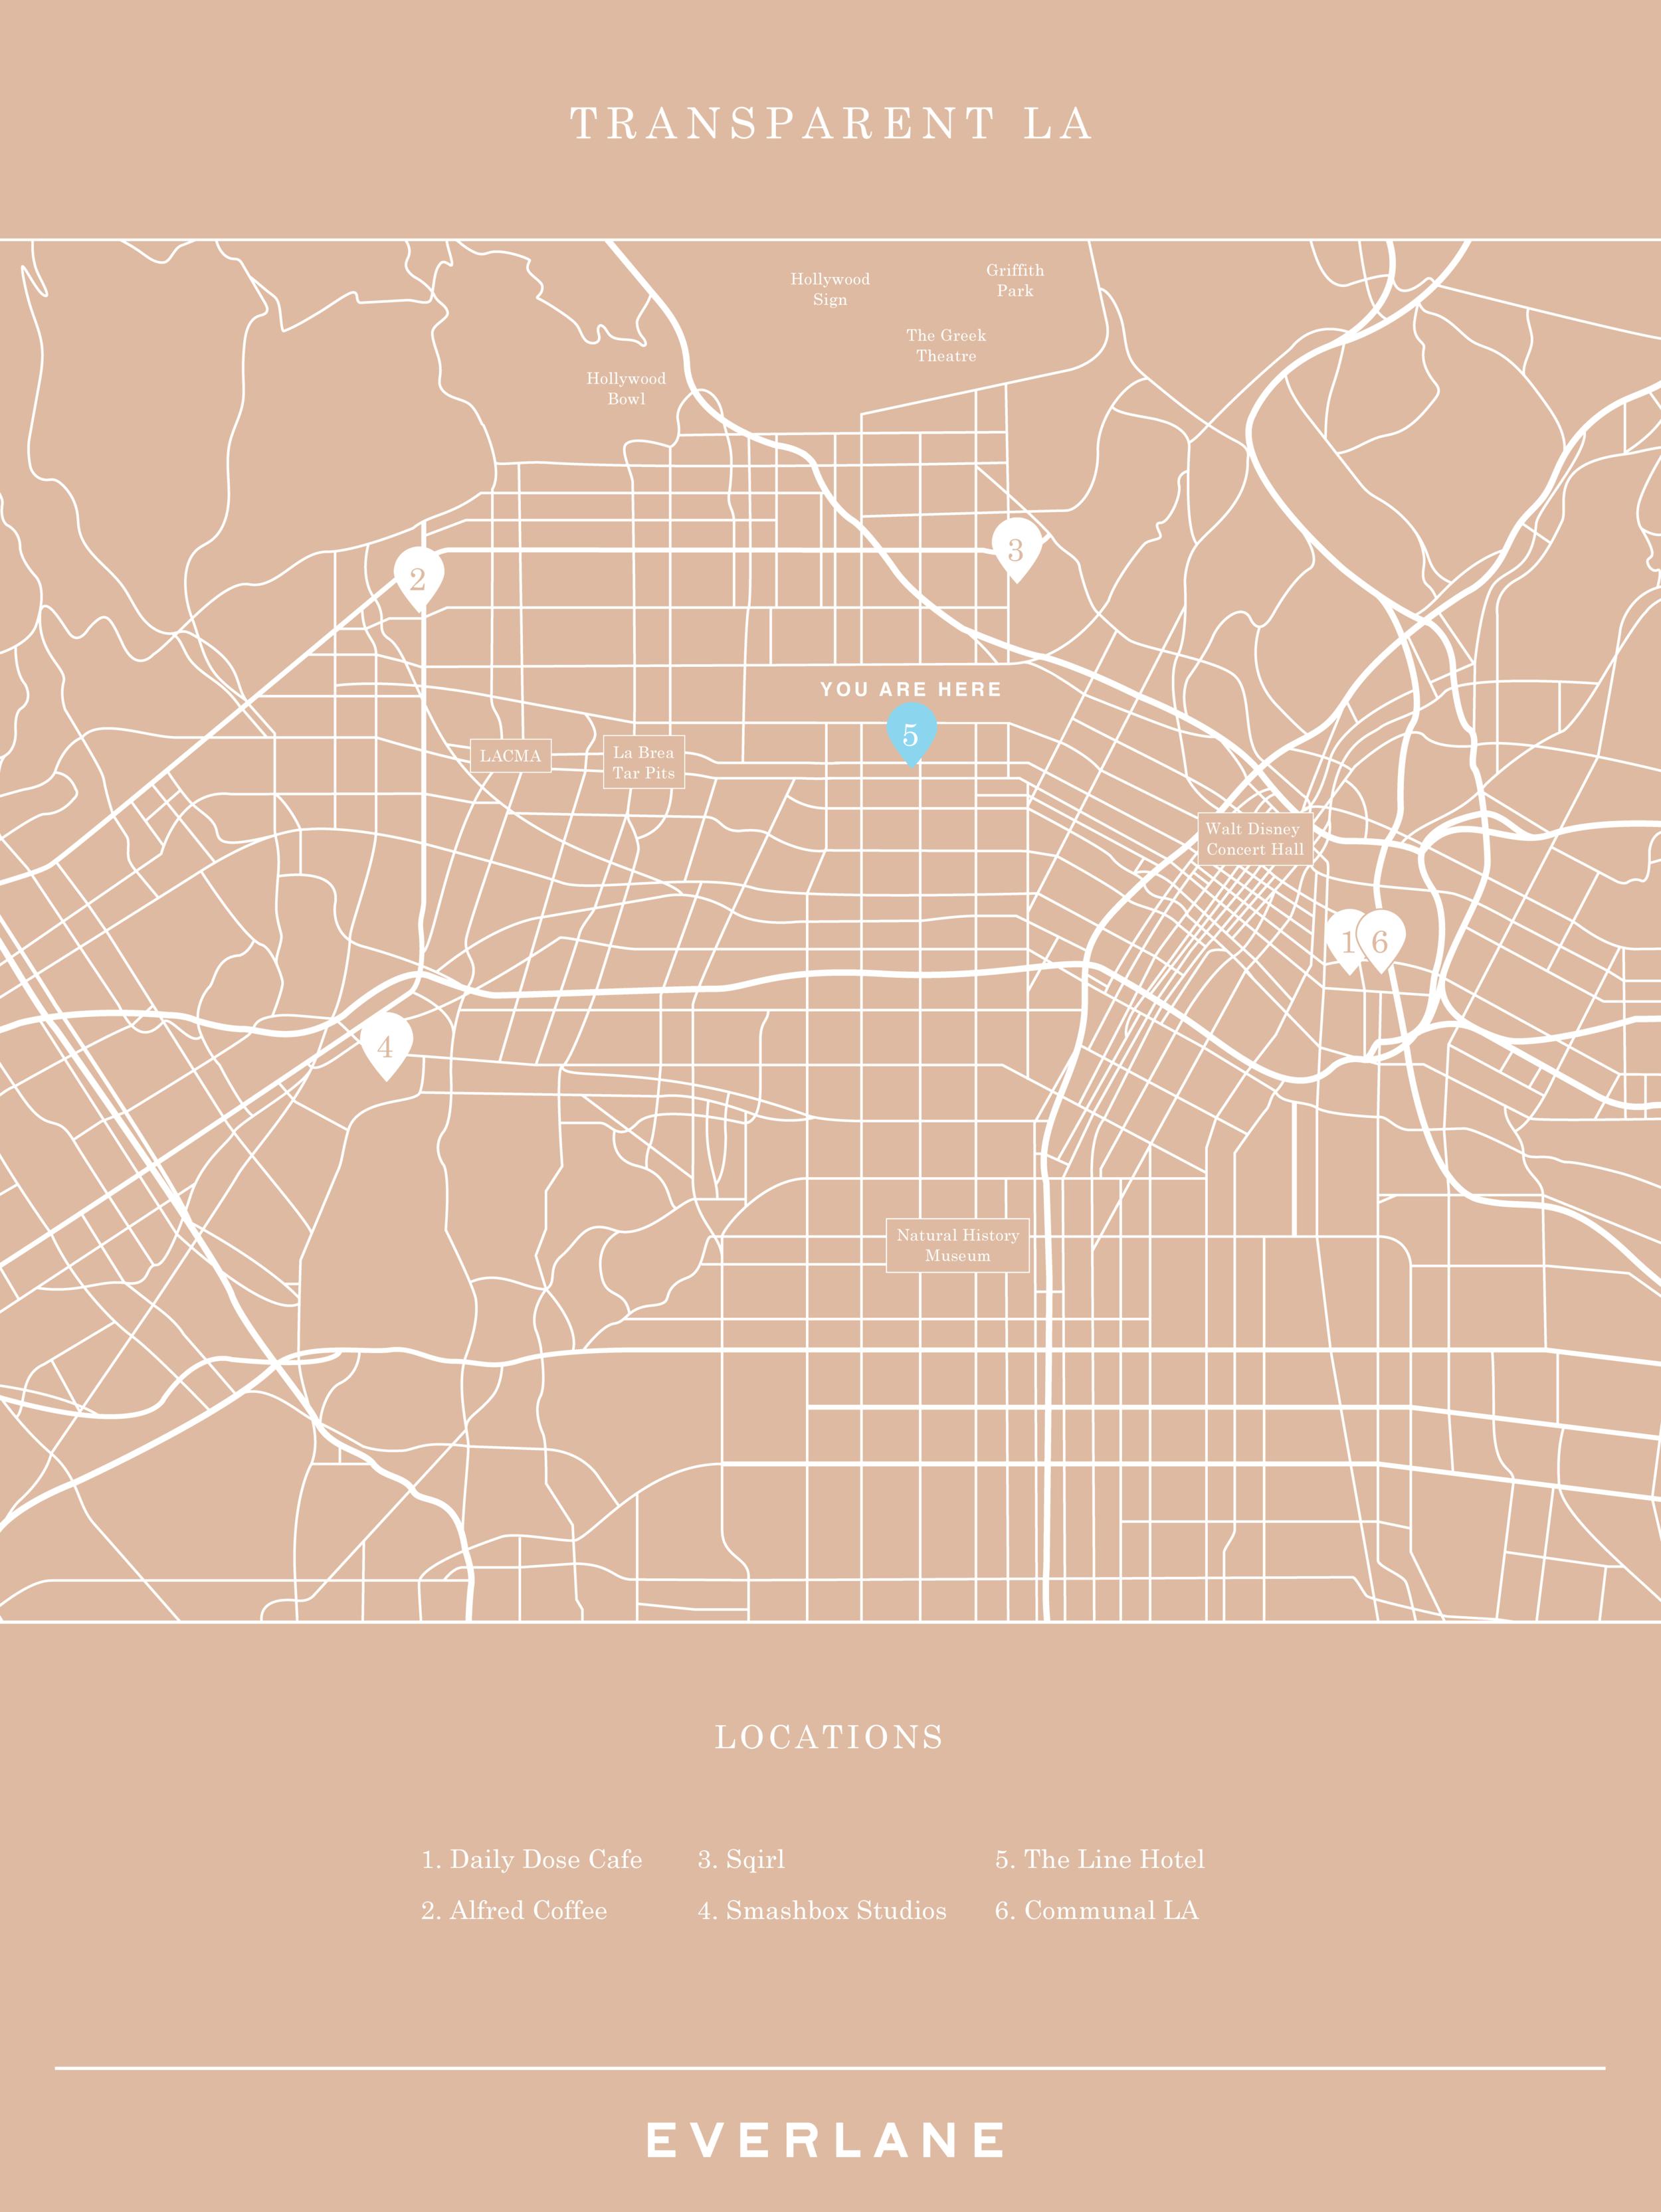 Feels-Design-Studio_Everlane-Transparent-LA